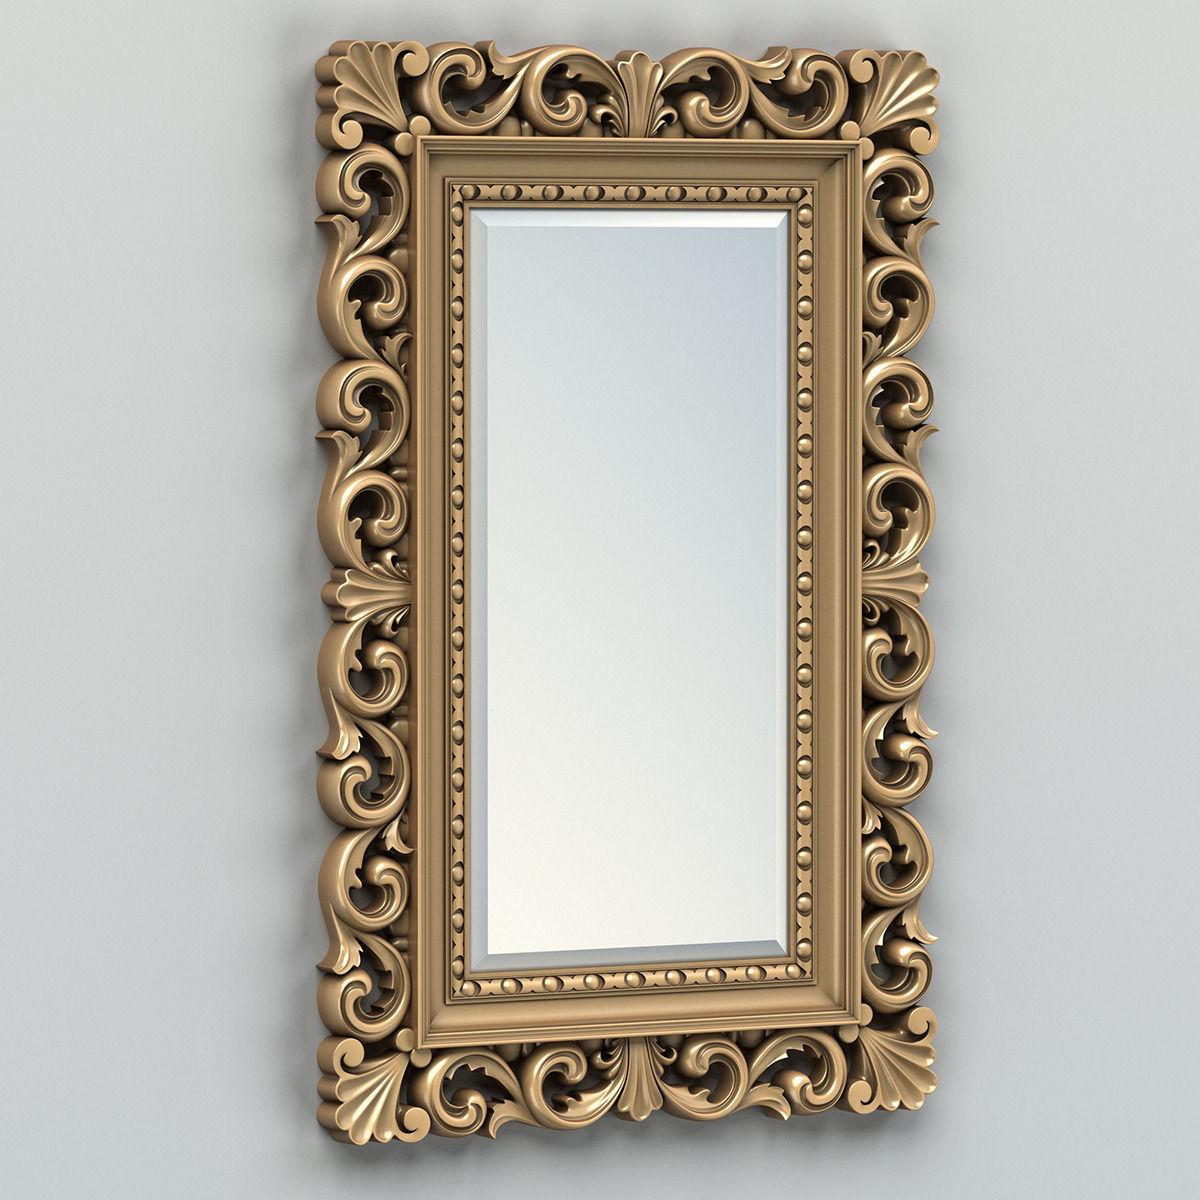 dekoratif-fotograf-cercevesi-modelleri-3